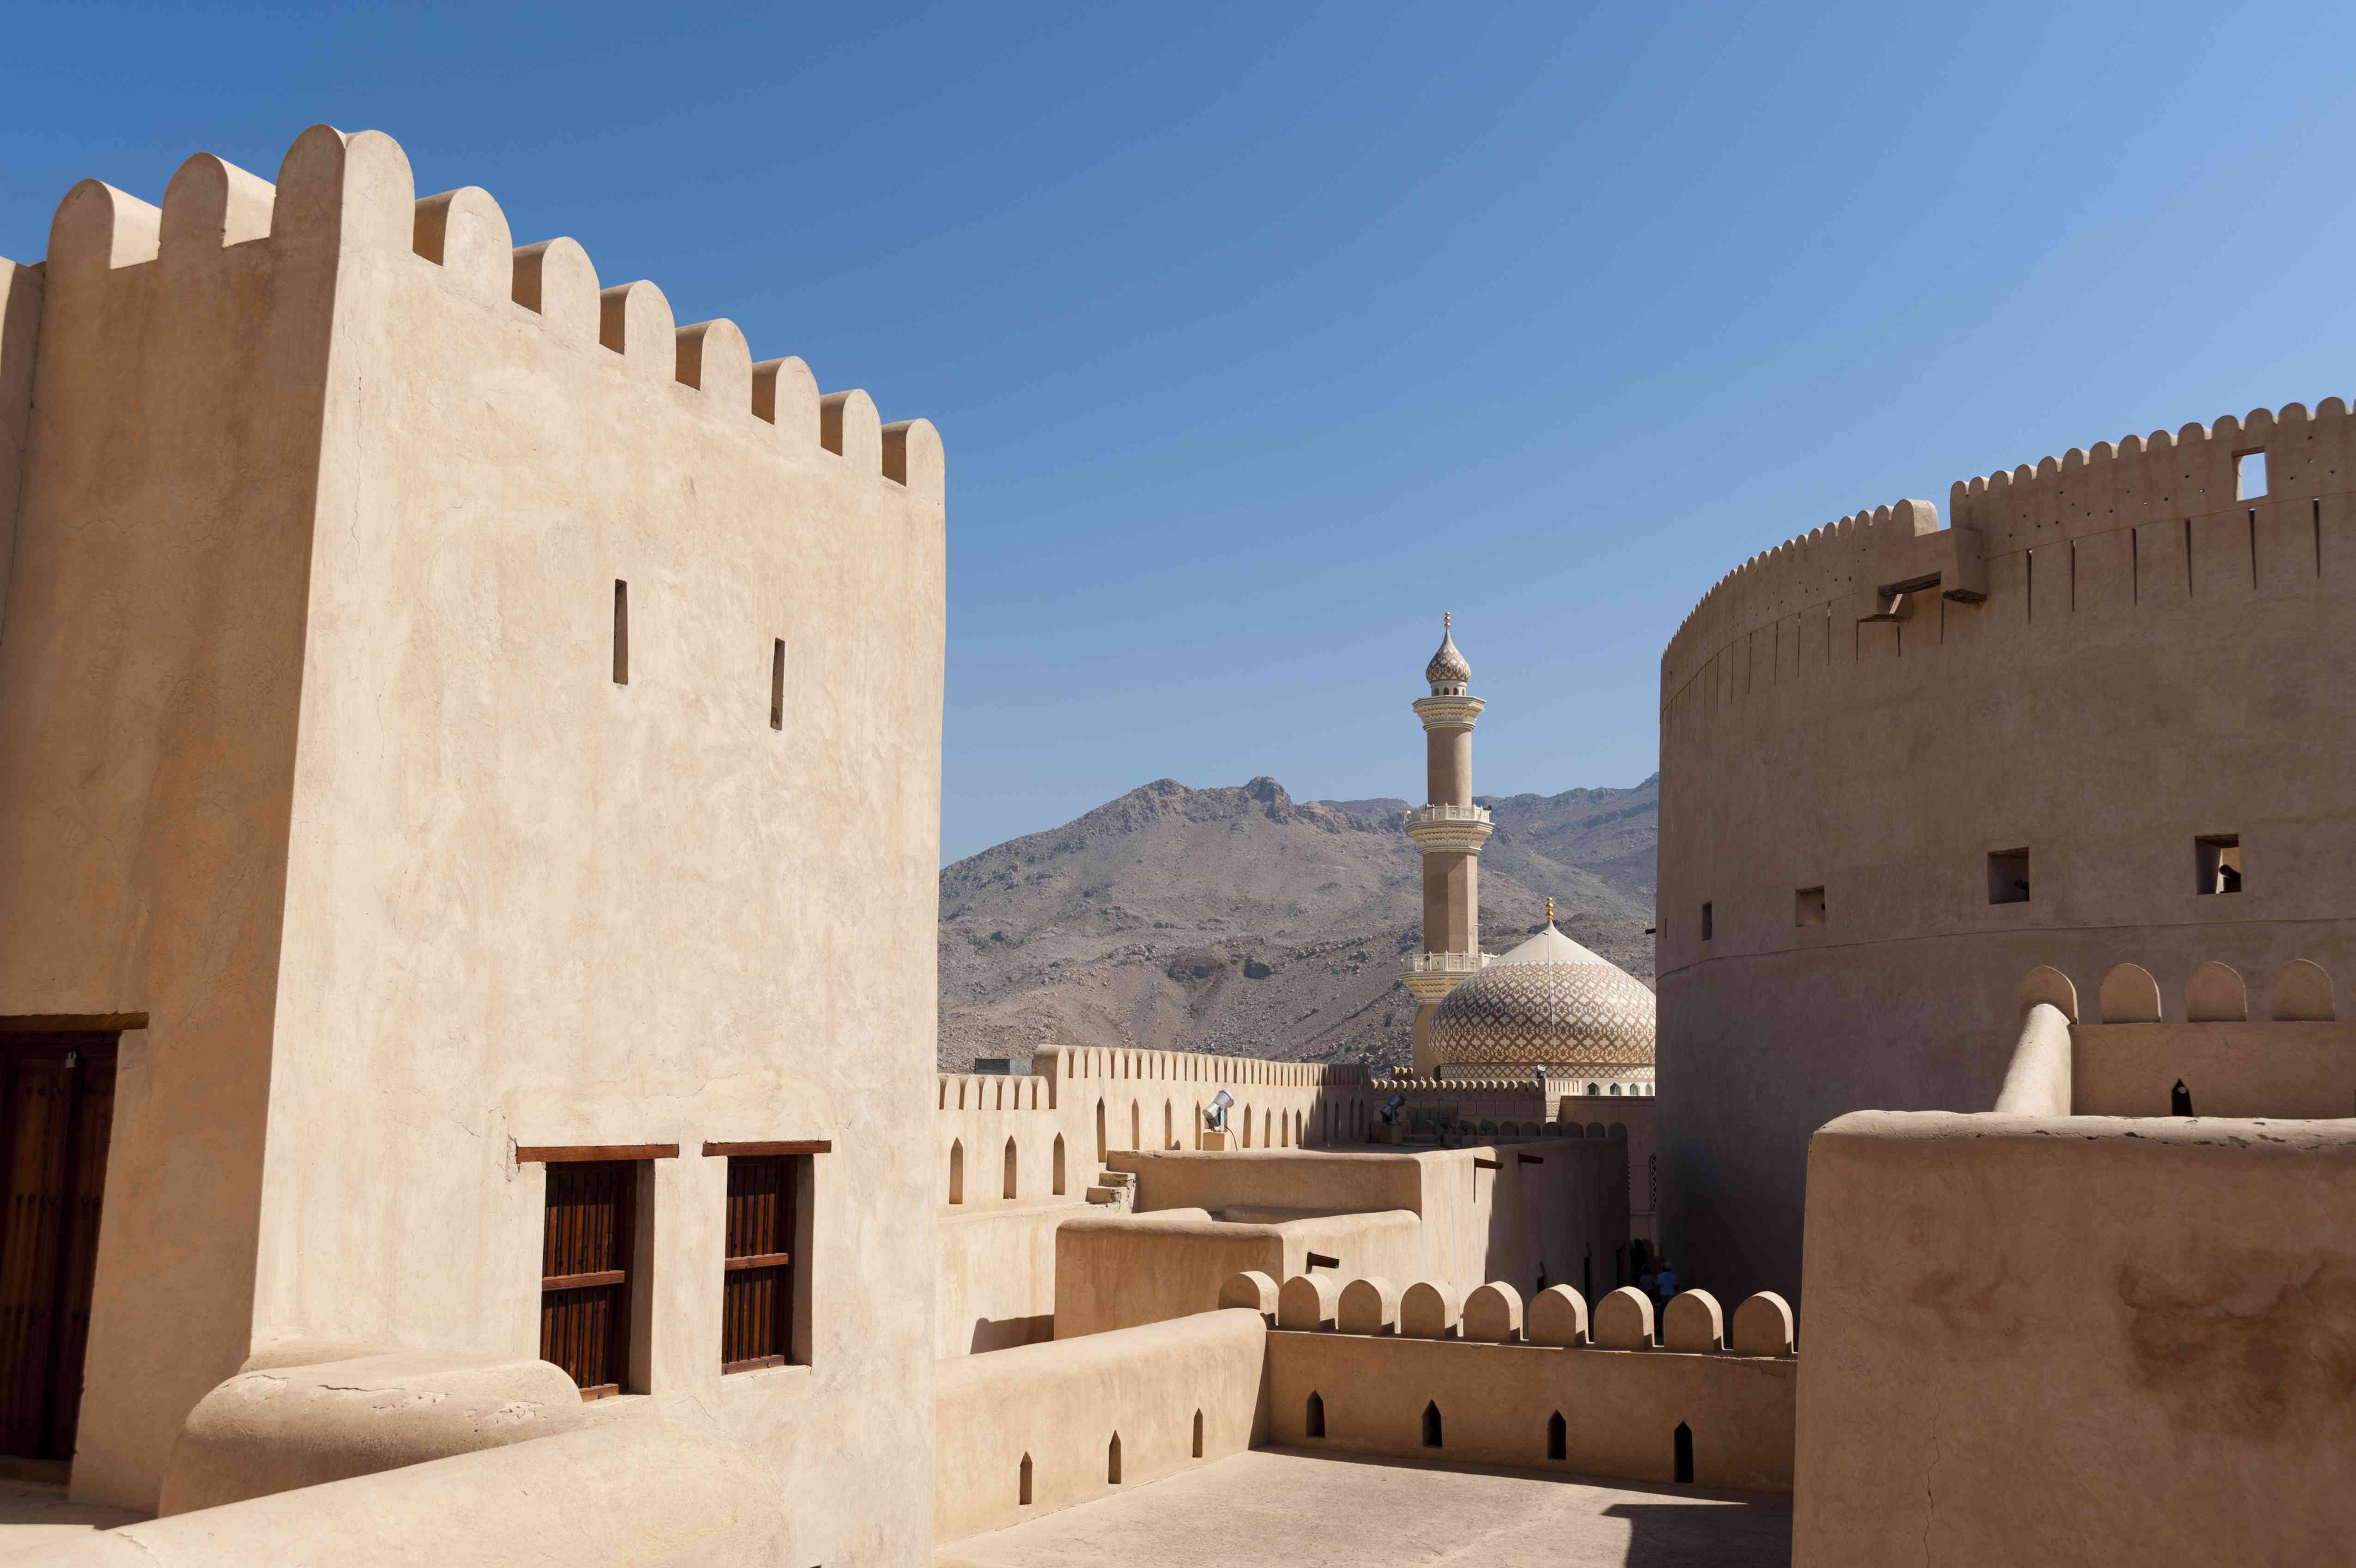 Light-colored stone ramparts at Nizwa fort, Oman